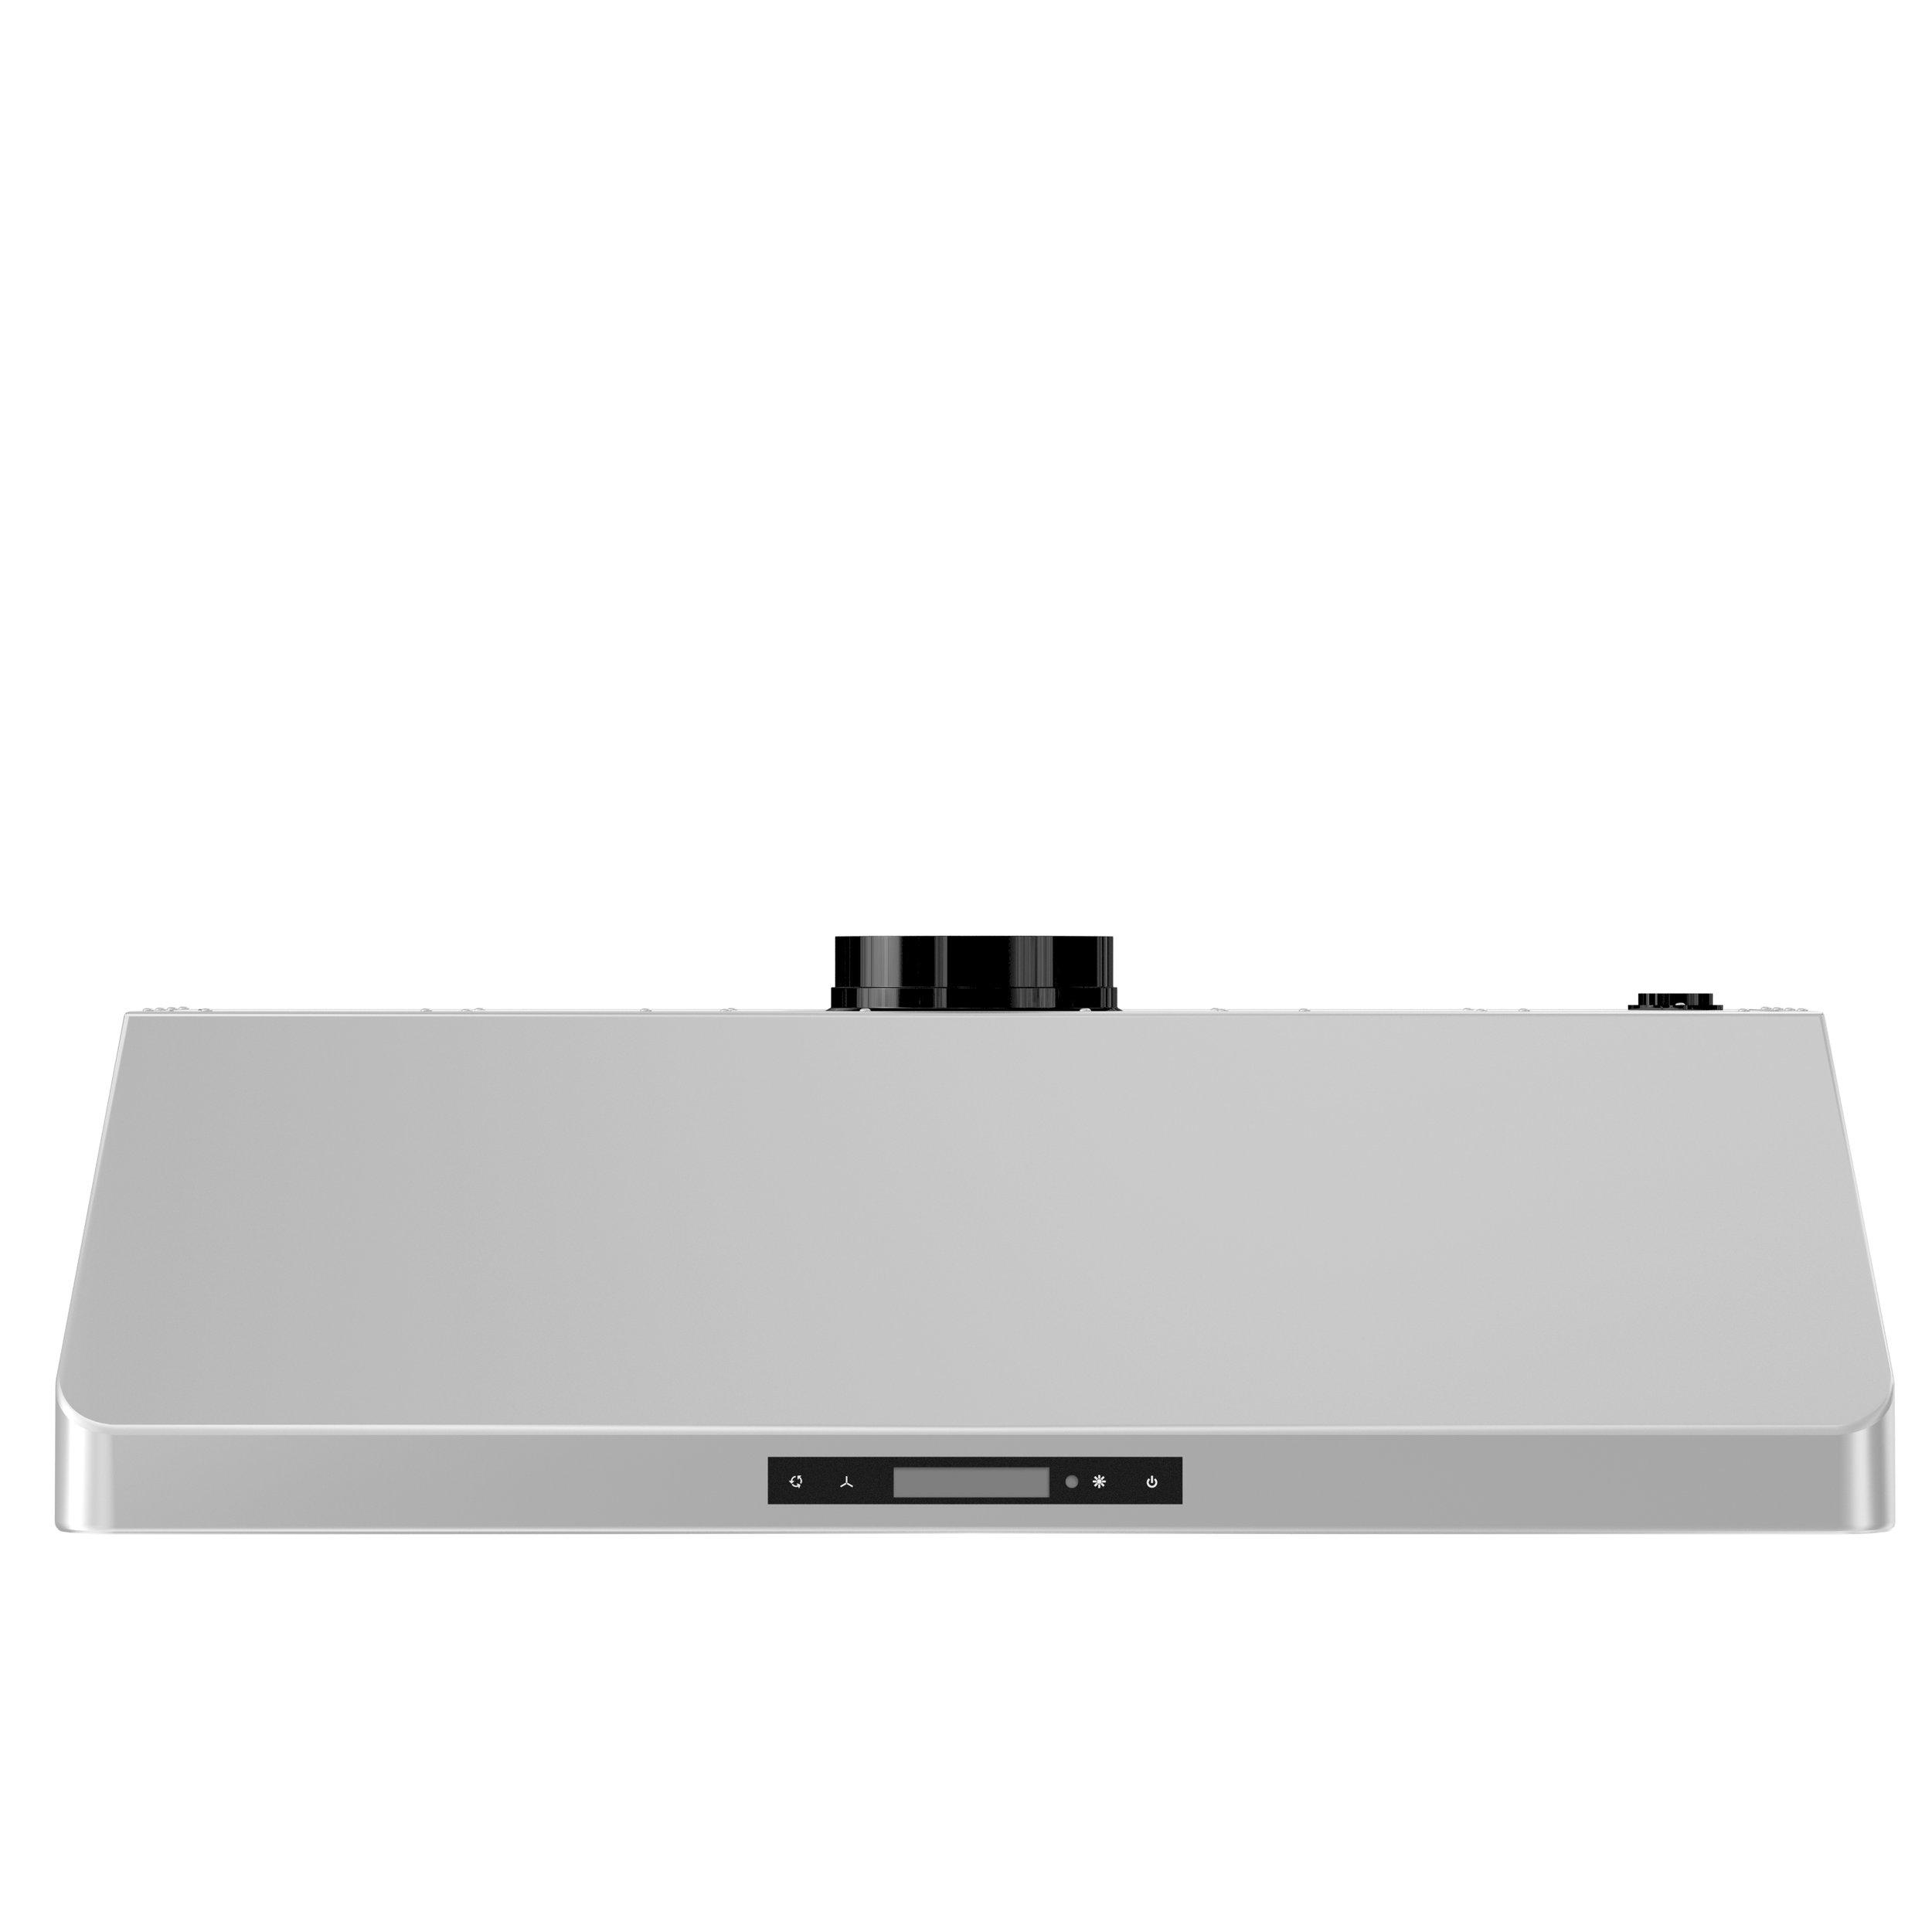 zline-stainless-steel-under-cabinet-range-hood-619-front.jpeg